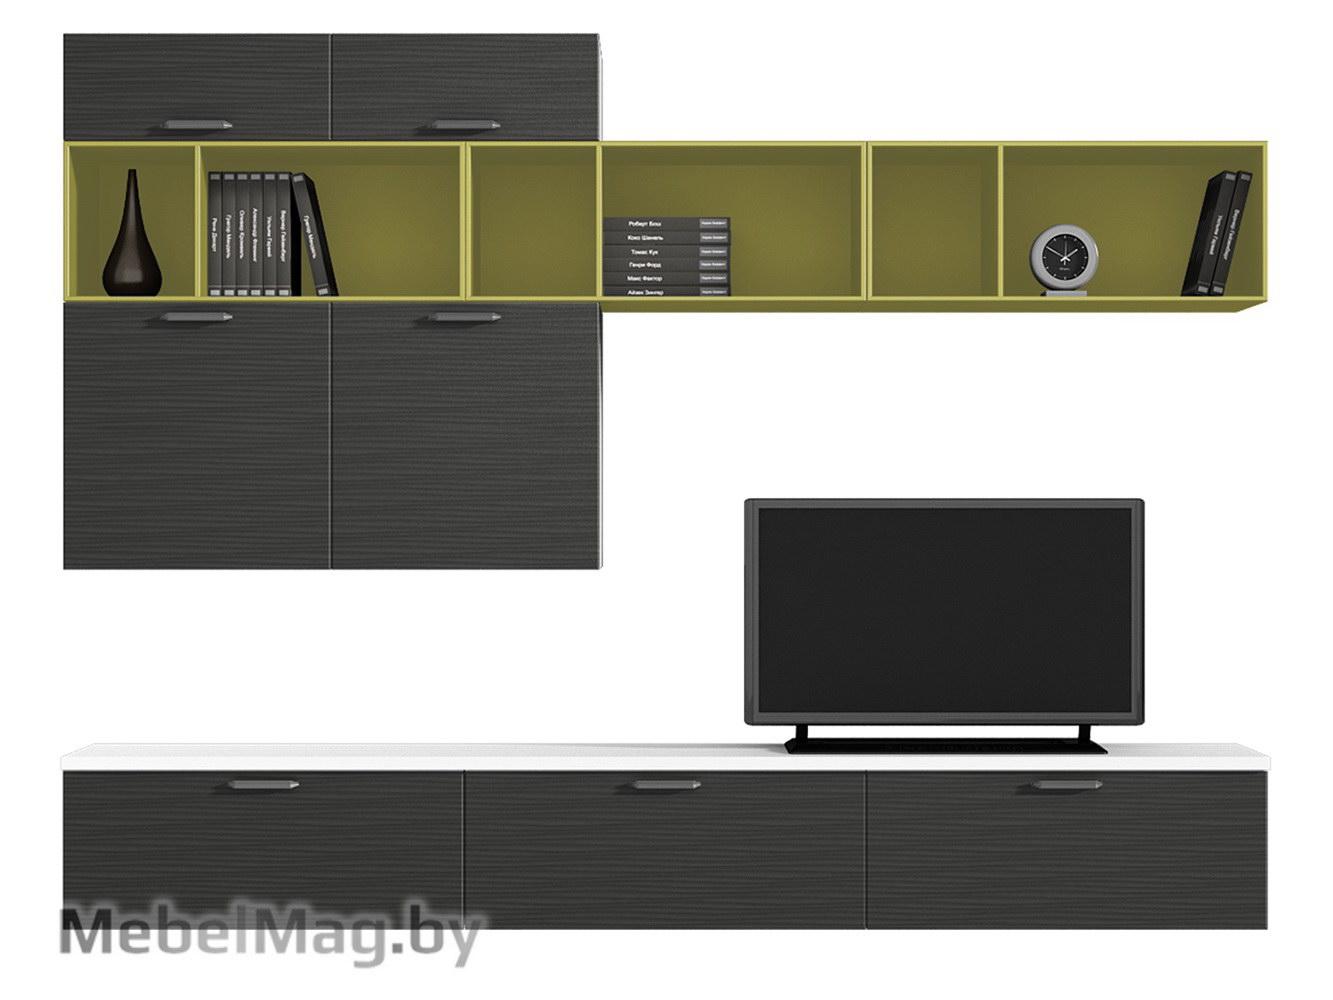 Гостиная Tela 2700 VKS422